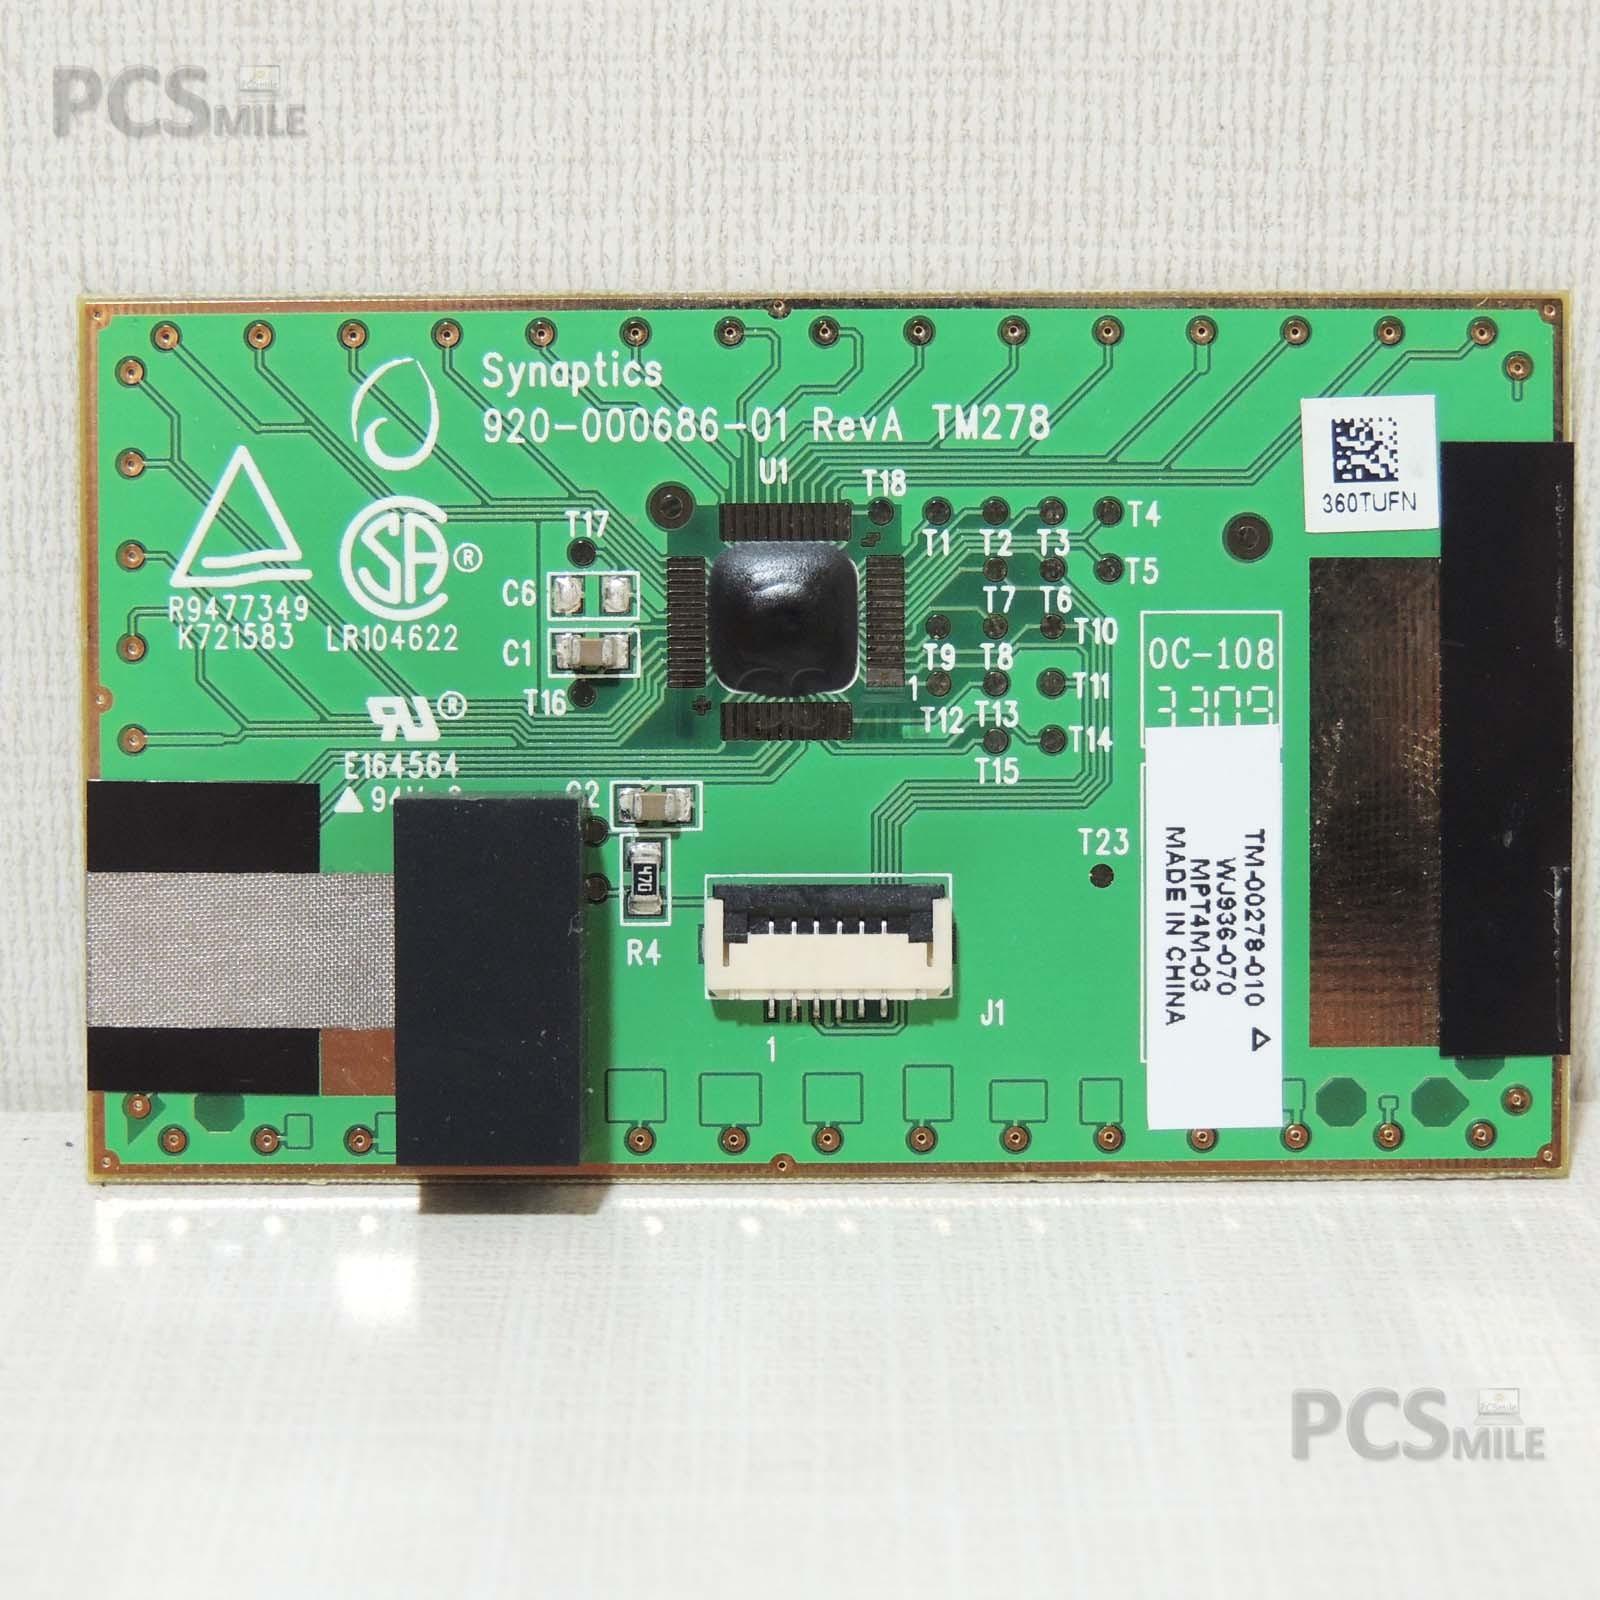 Touchpad originale Fujitsu Esprimo Mobile V6555 Z17M 920-000686-01 REVa tm278